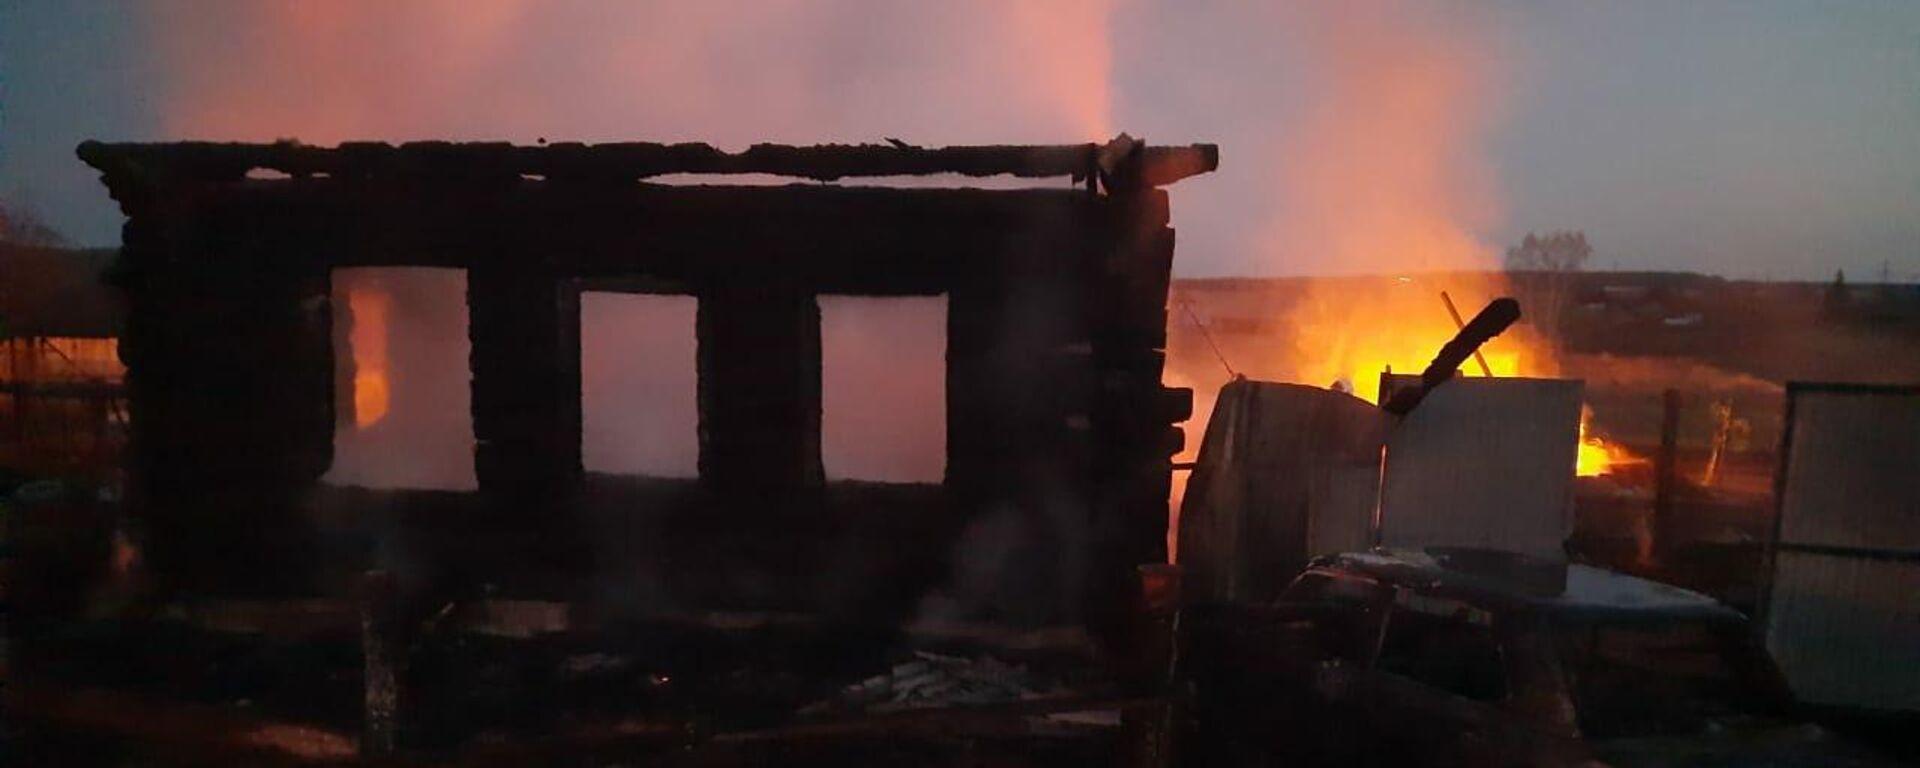 Wohnhausbrand im Dorf Bysowo (Ural) - SNA, 1920, 15.04.2021